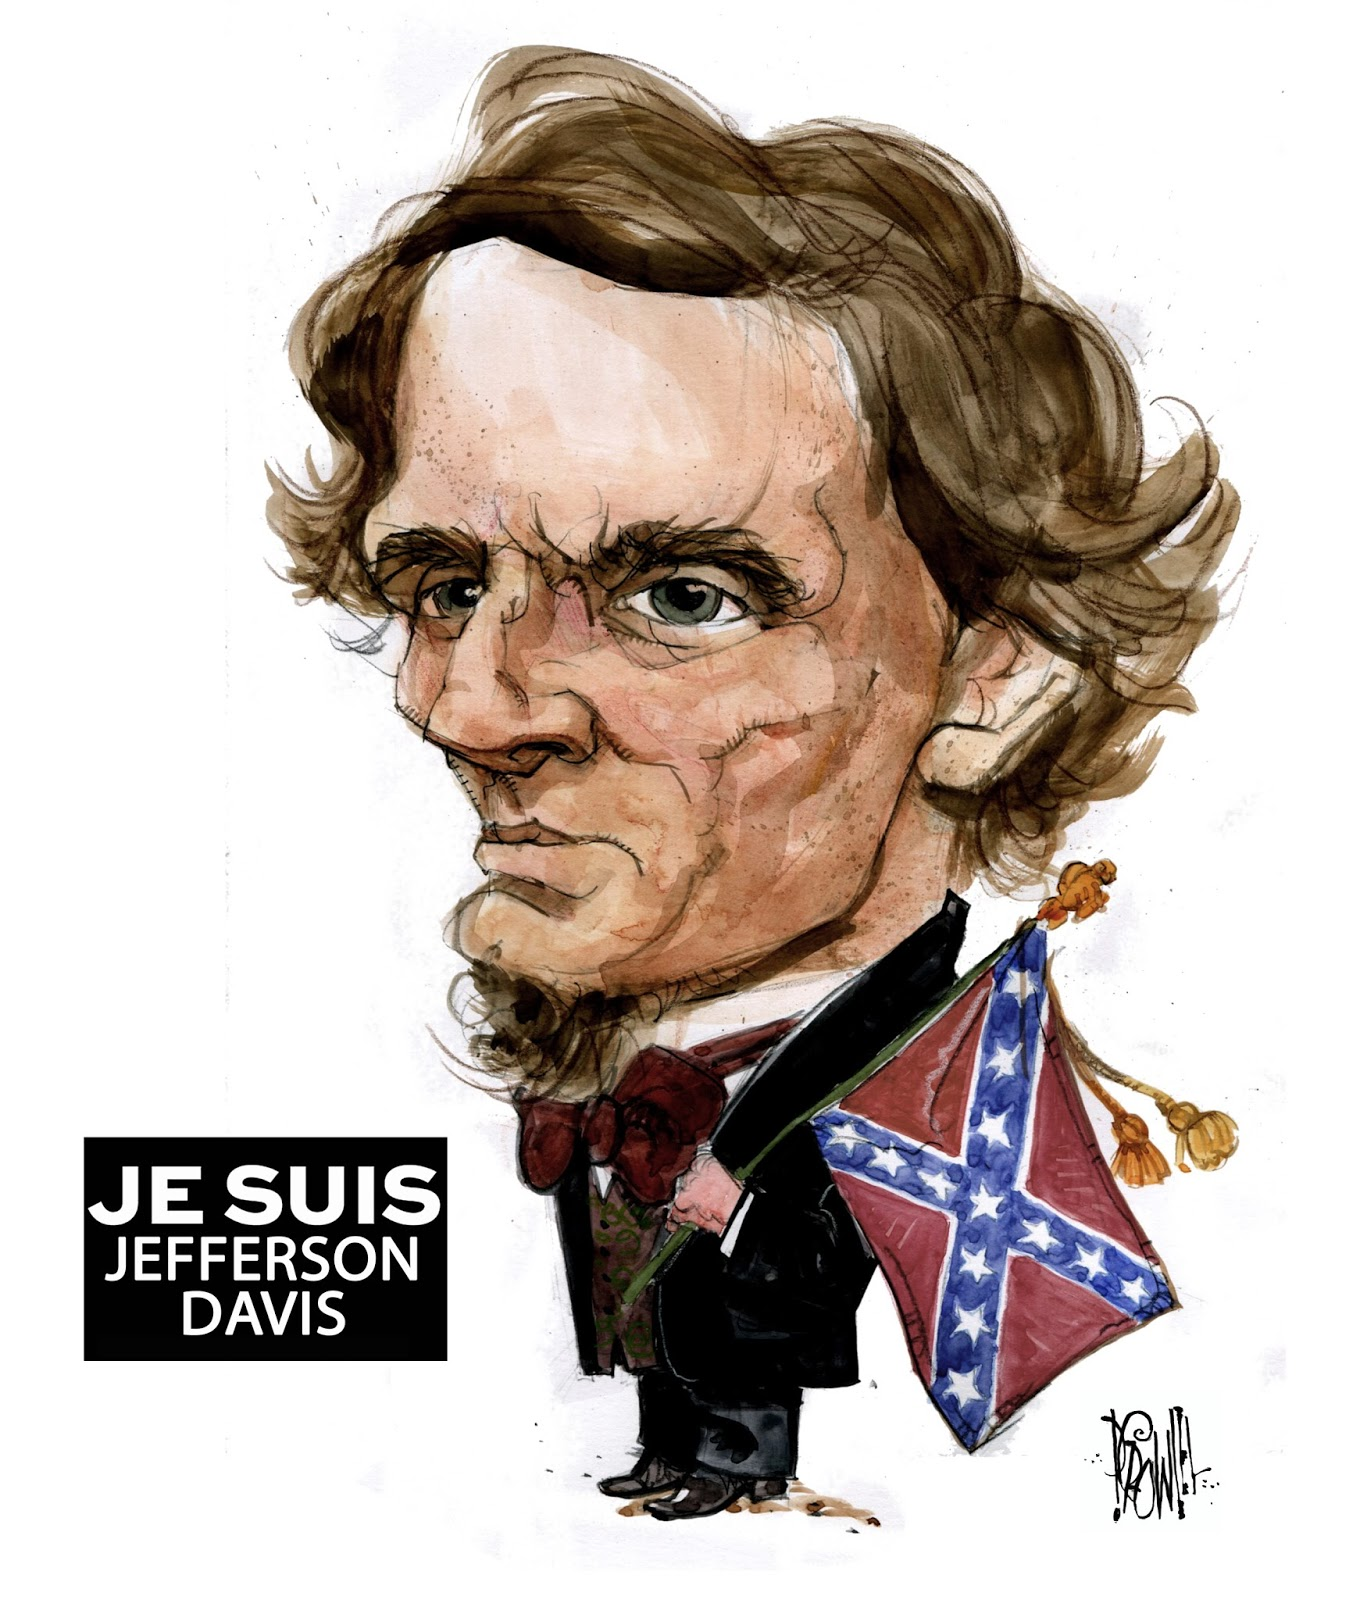 Vancouver Artist S Cartoon Of Florida School Shooting: Pat Crowley's Penheads: Je Suis Jefferson Davis